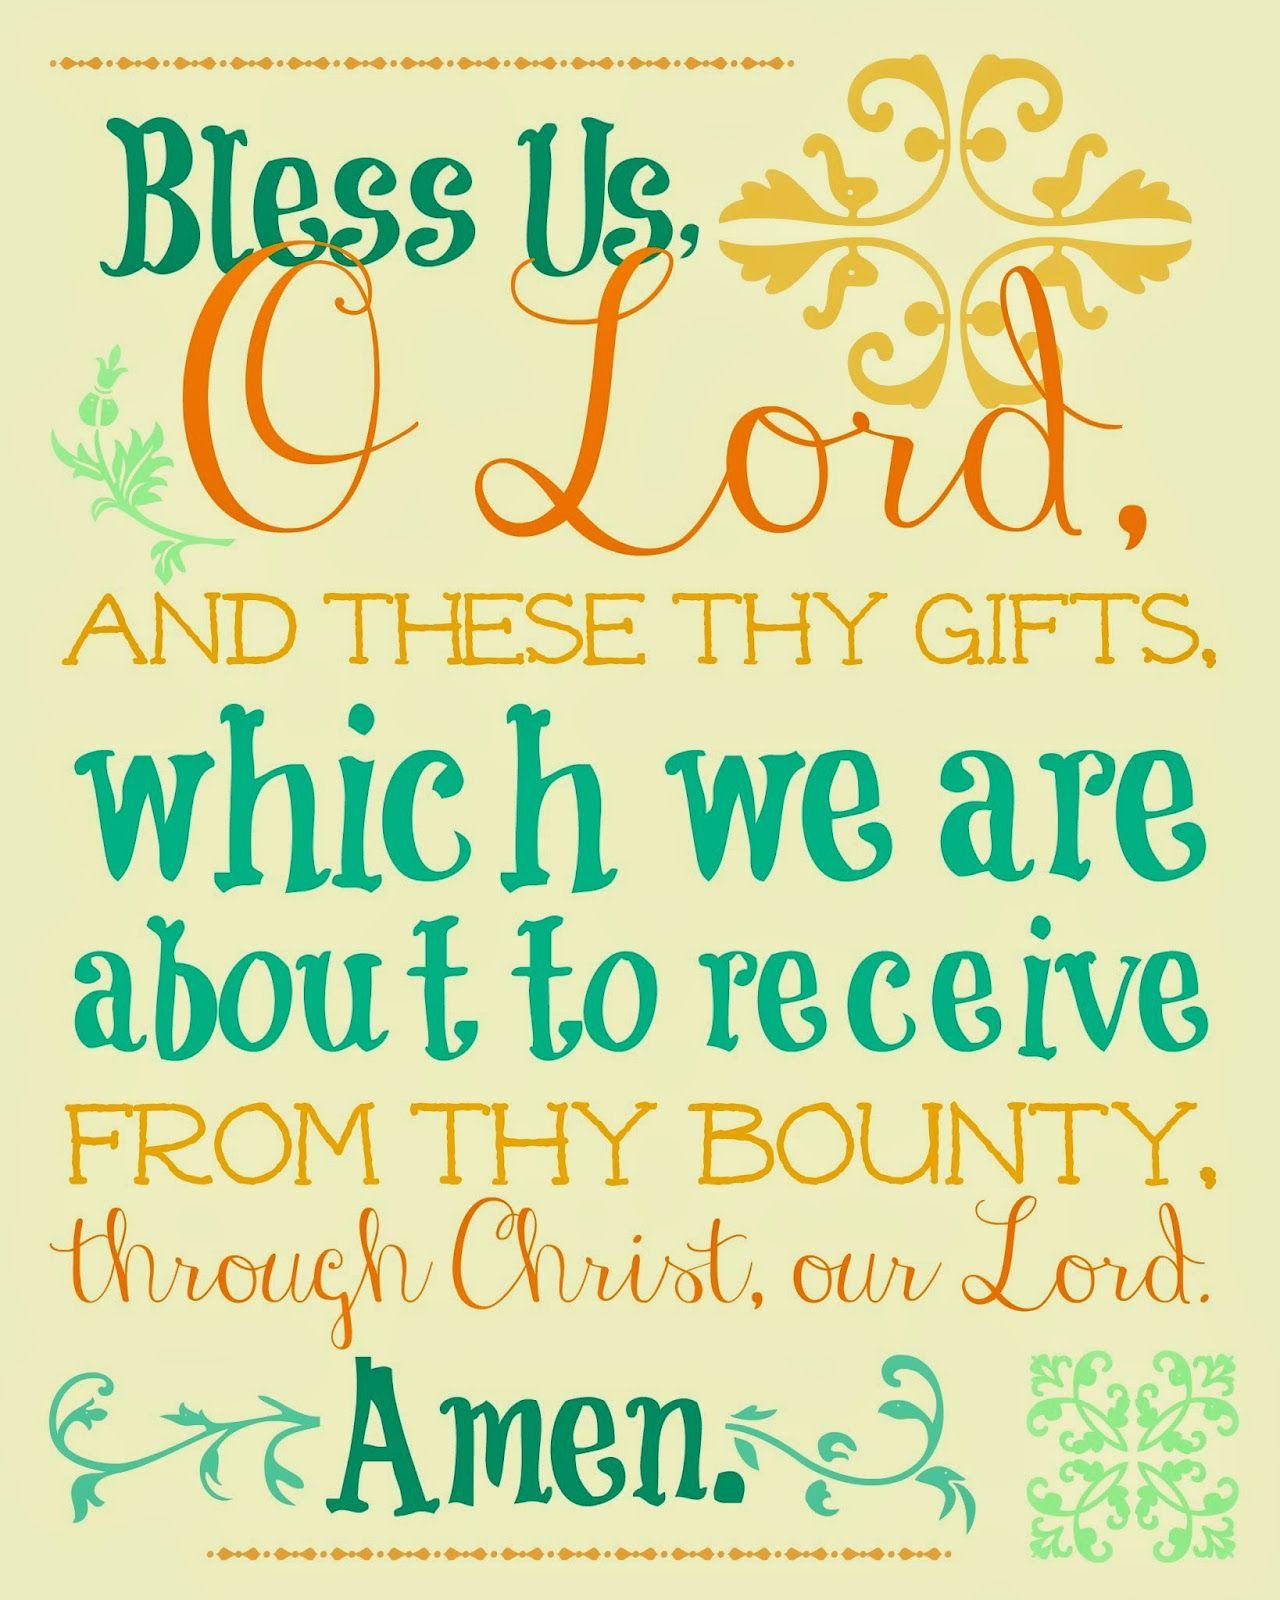 Free Printable Prayers For Your Printing And Praying Pleasure, And A - Free Printable Catholic Prayer Cards